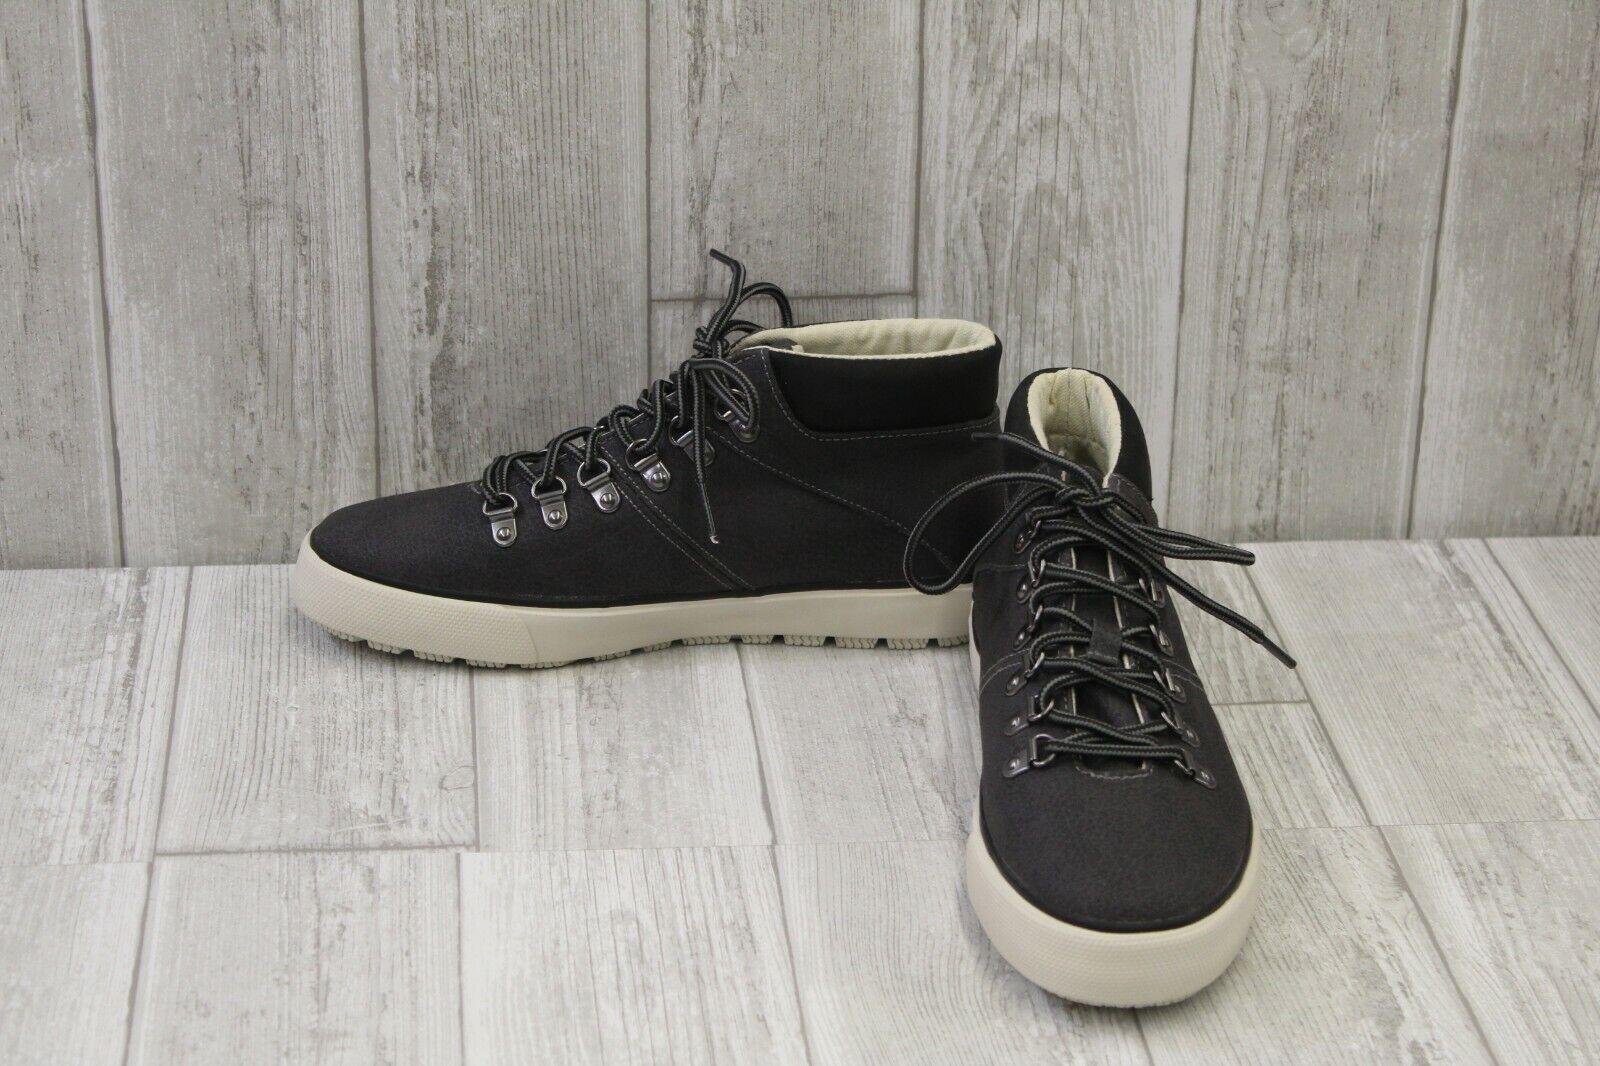 Sperry Striper Alpine Casual shoes - Men's Size 7.5 M - Grey